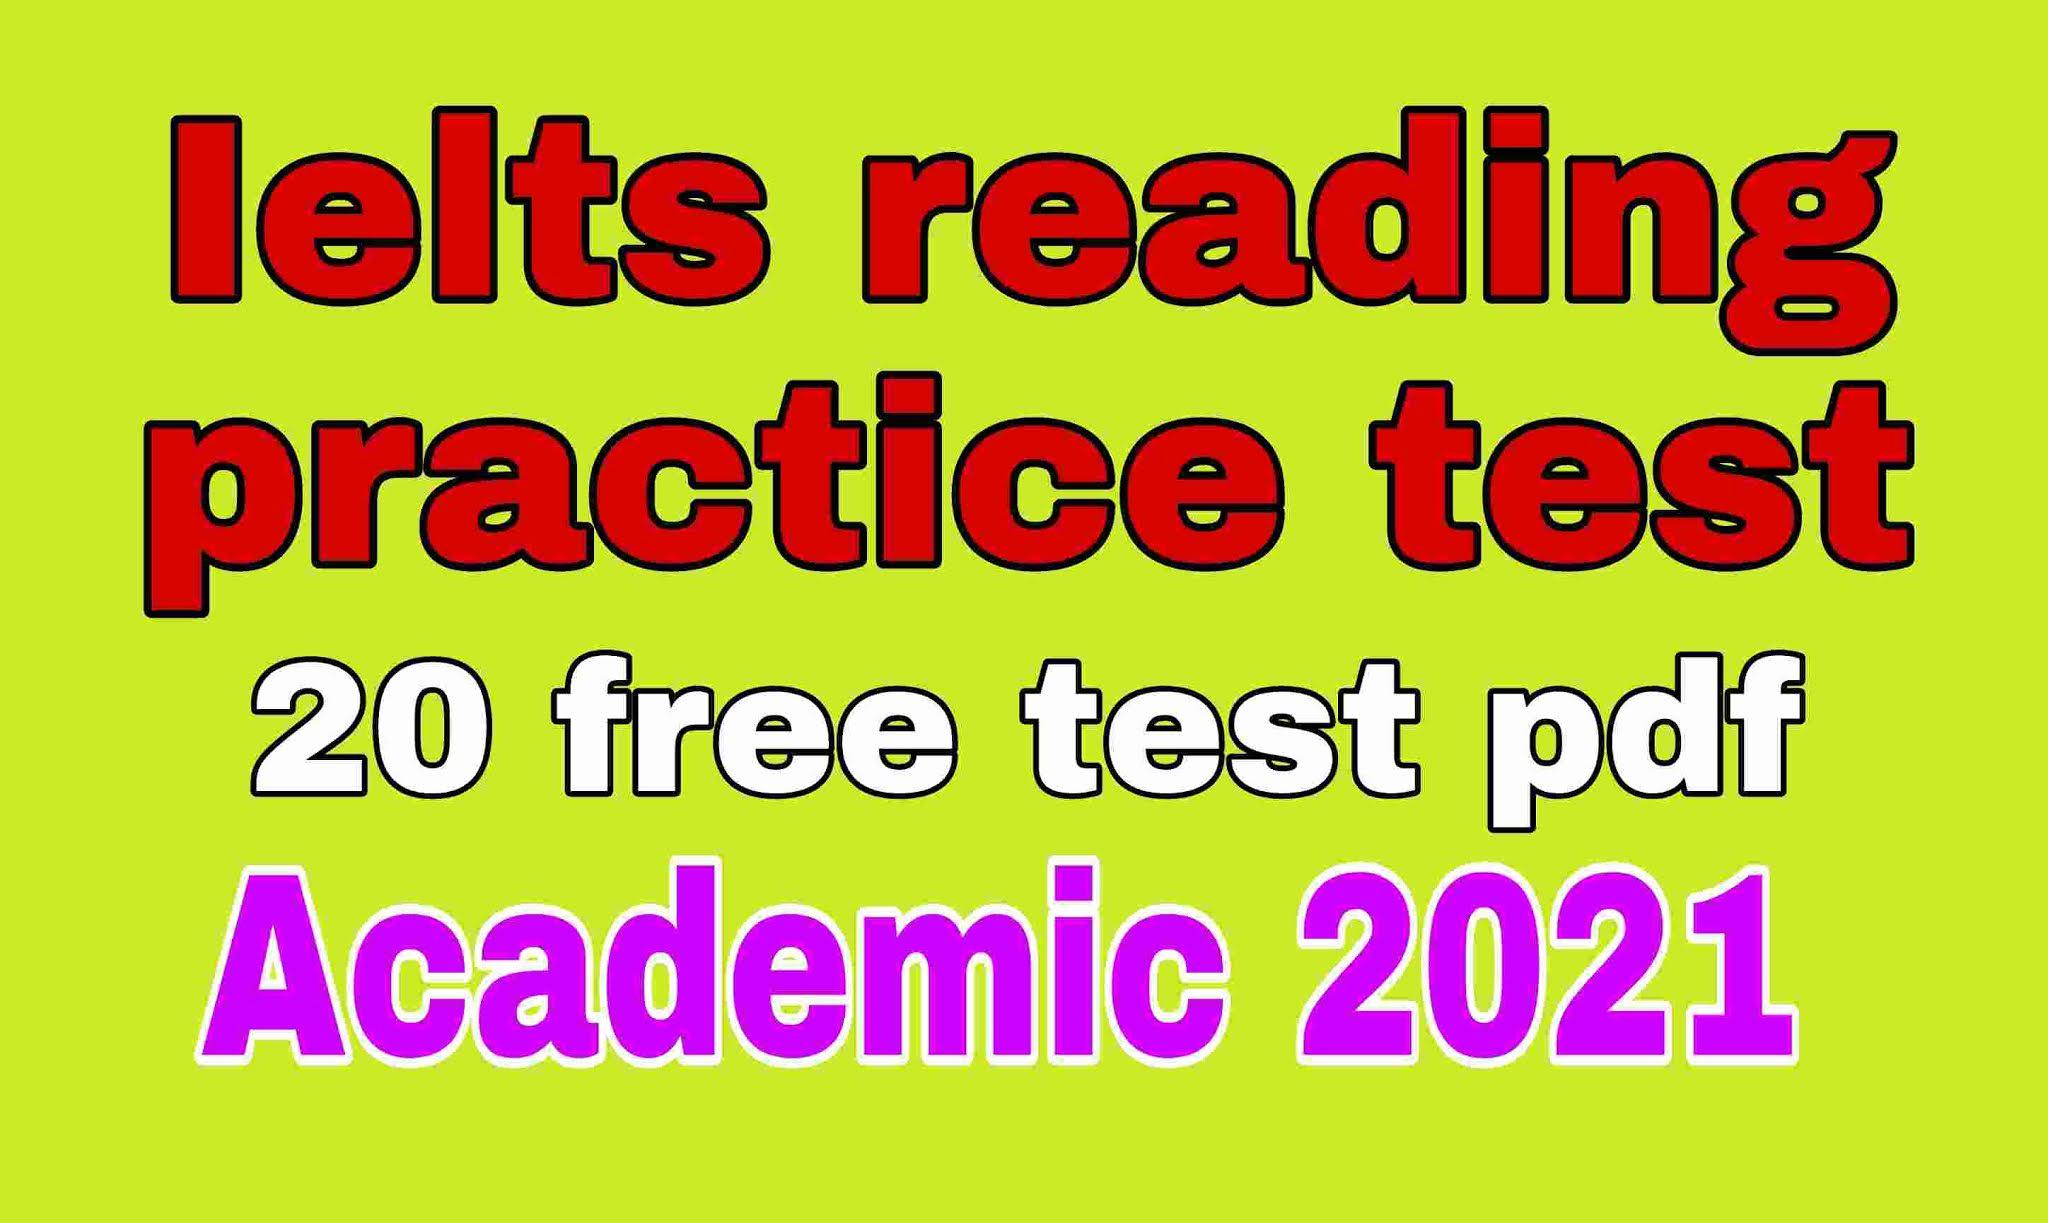 Ielts reading practice test 2021 pdf